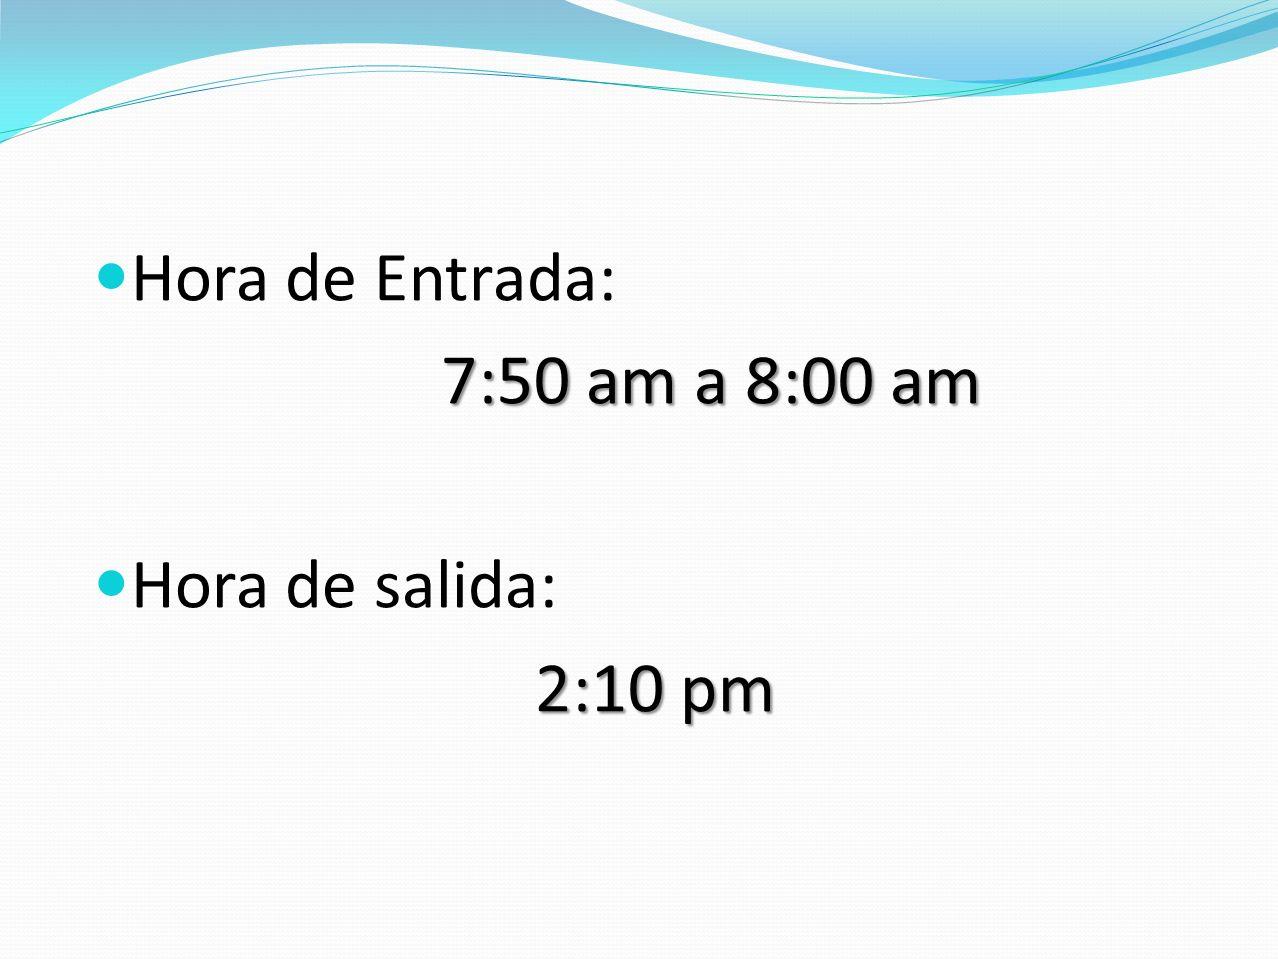 Hora de Entrada: 7:50 am a 8:00 am Hora de salida: 2:10 pm